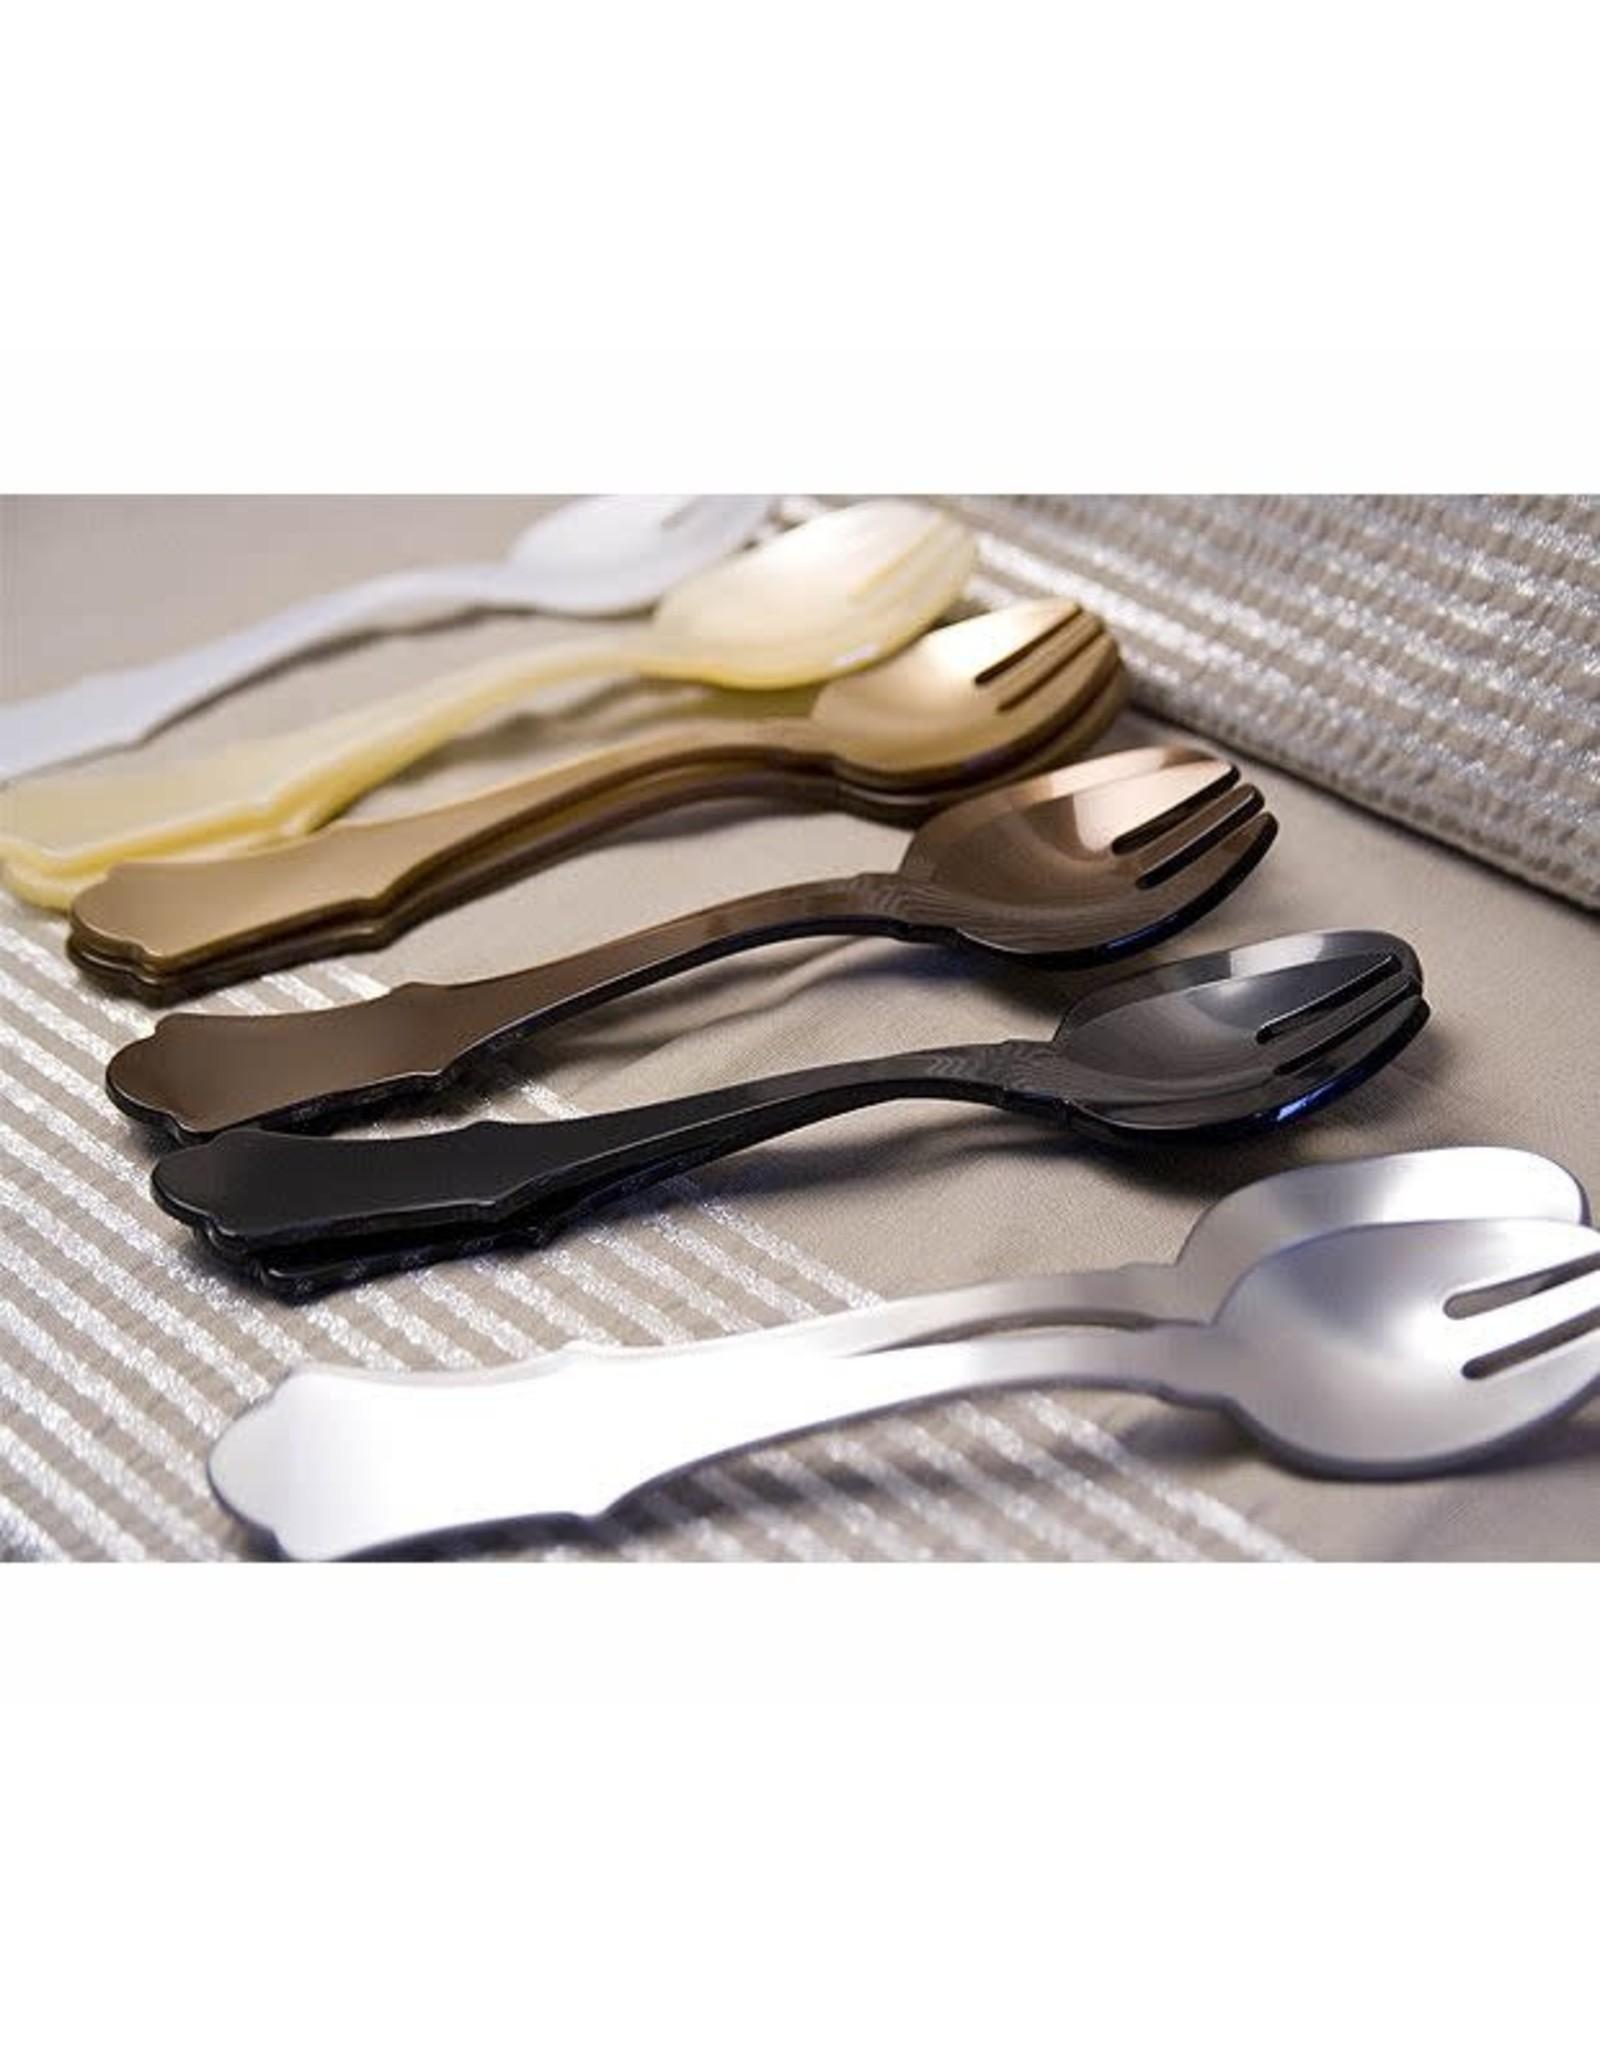 Lucite Tea Spoons Assorted